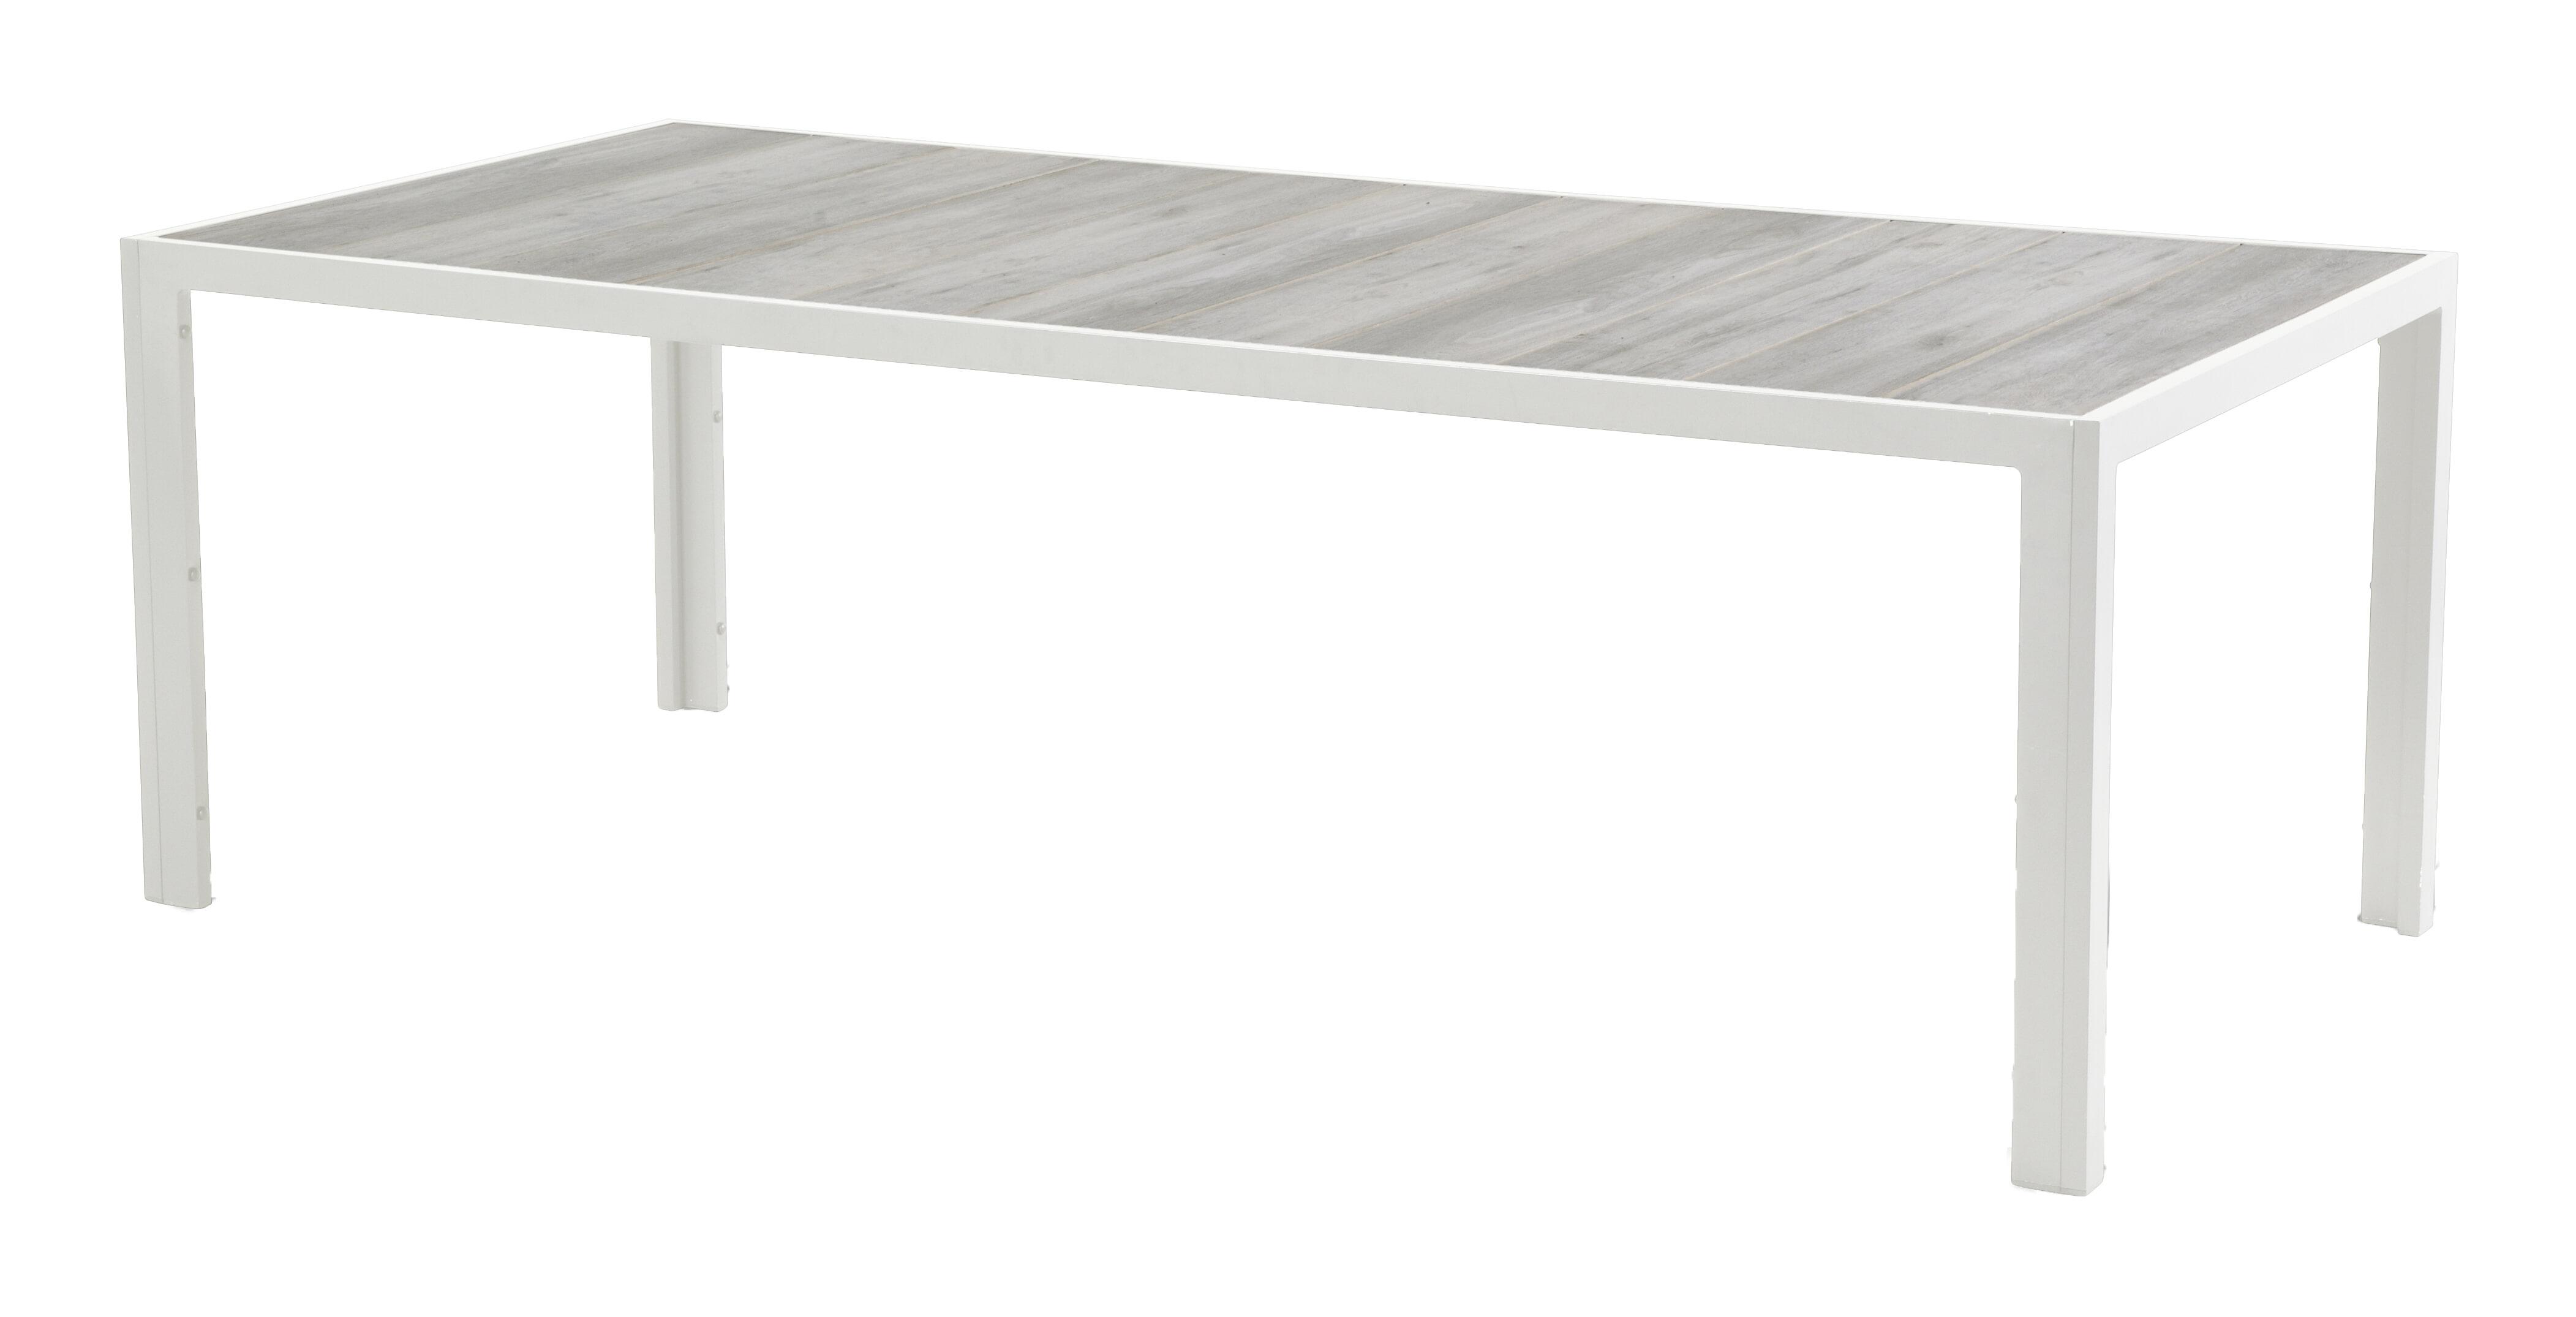 Hartman Tuintafel 'Tanger' 228 x 105cm, kleur Wit